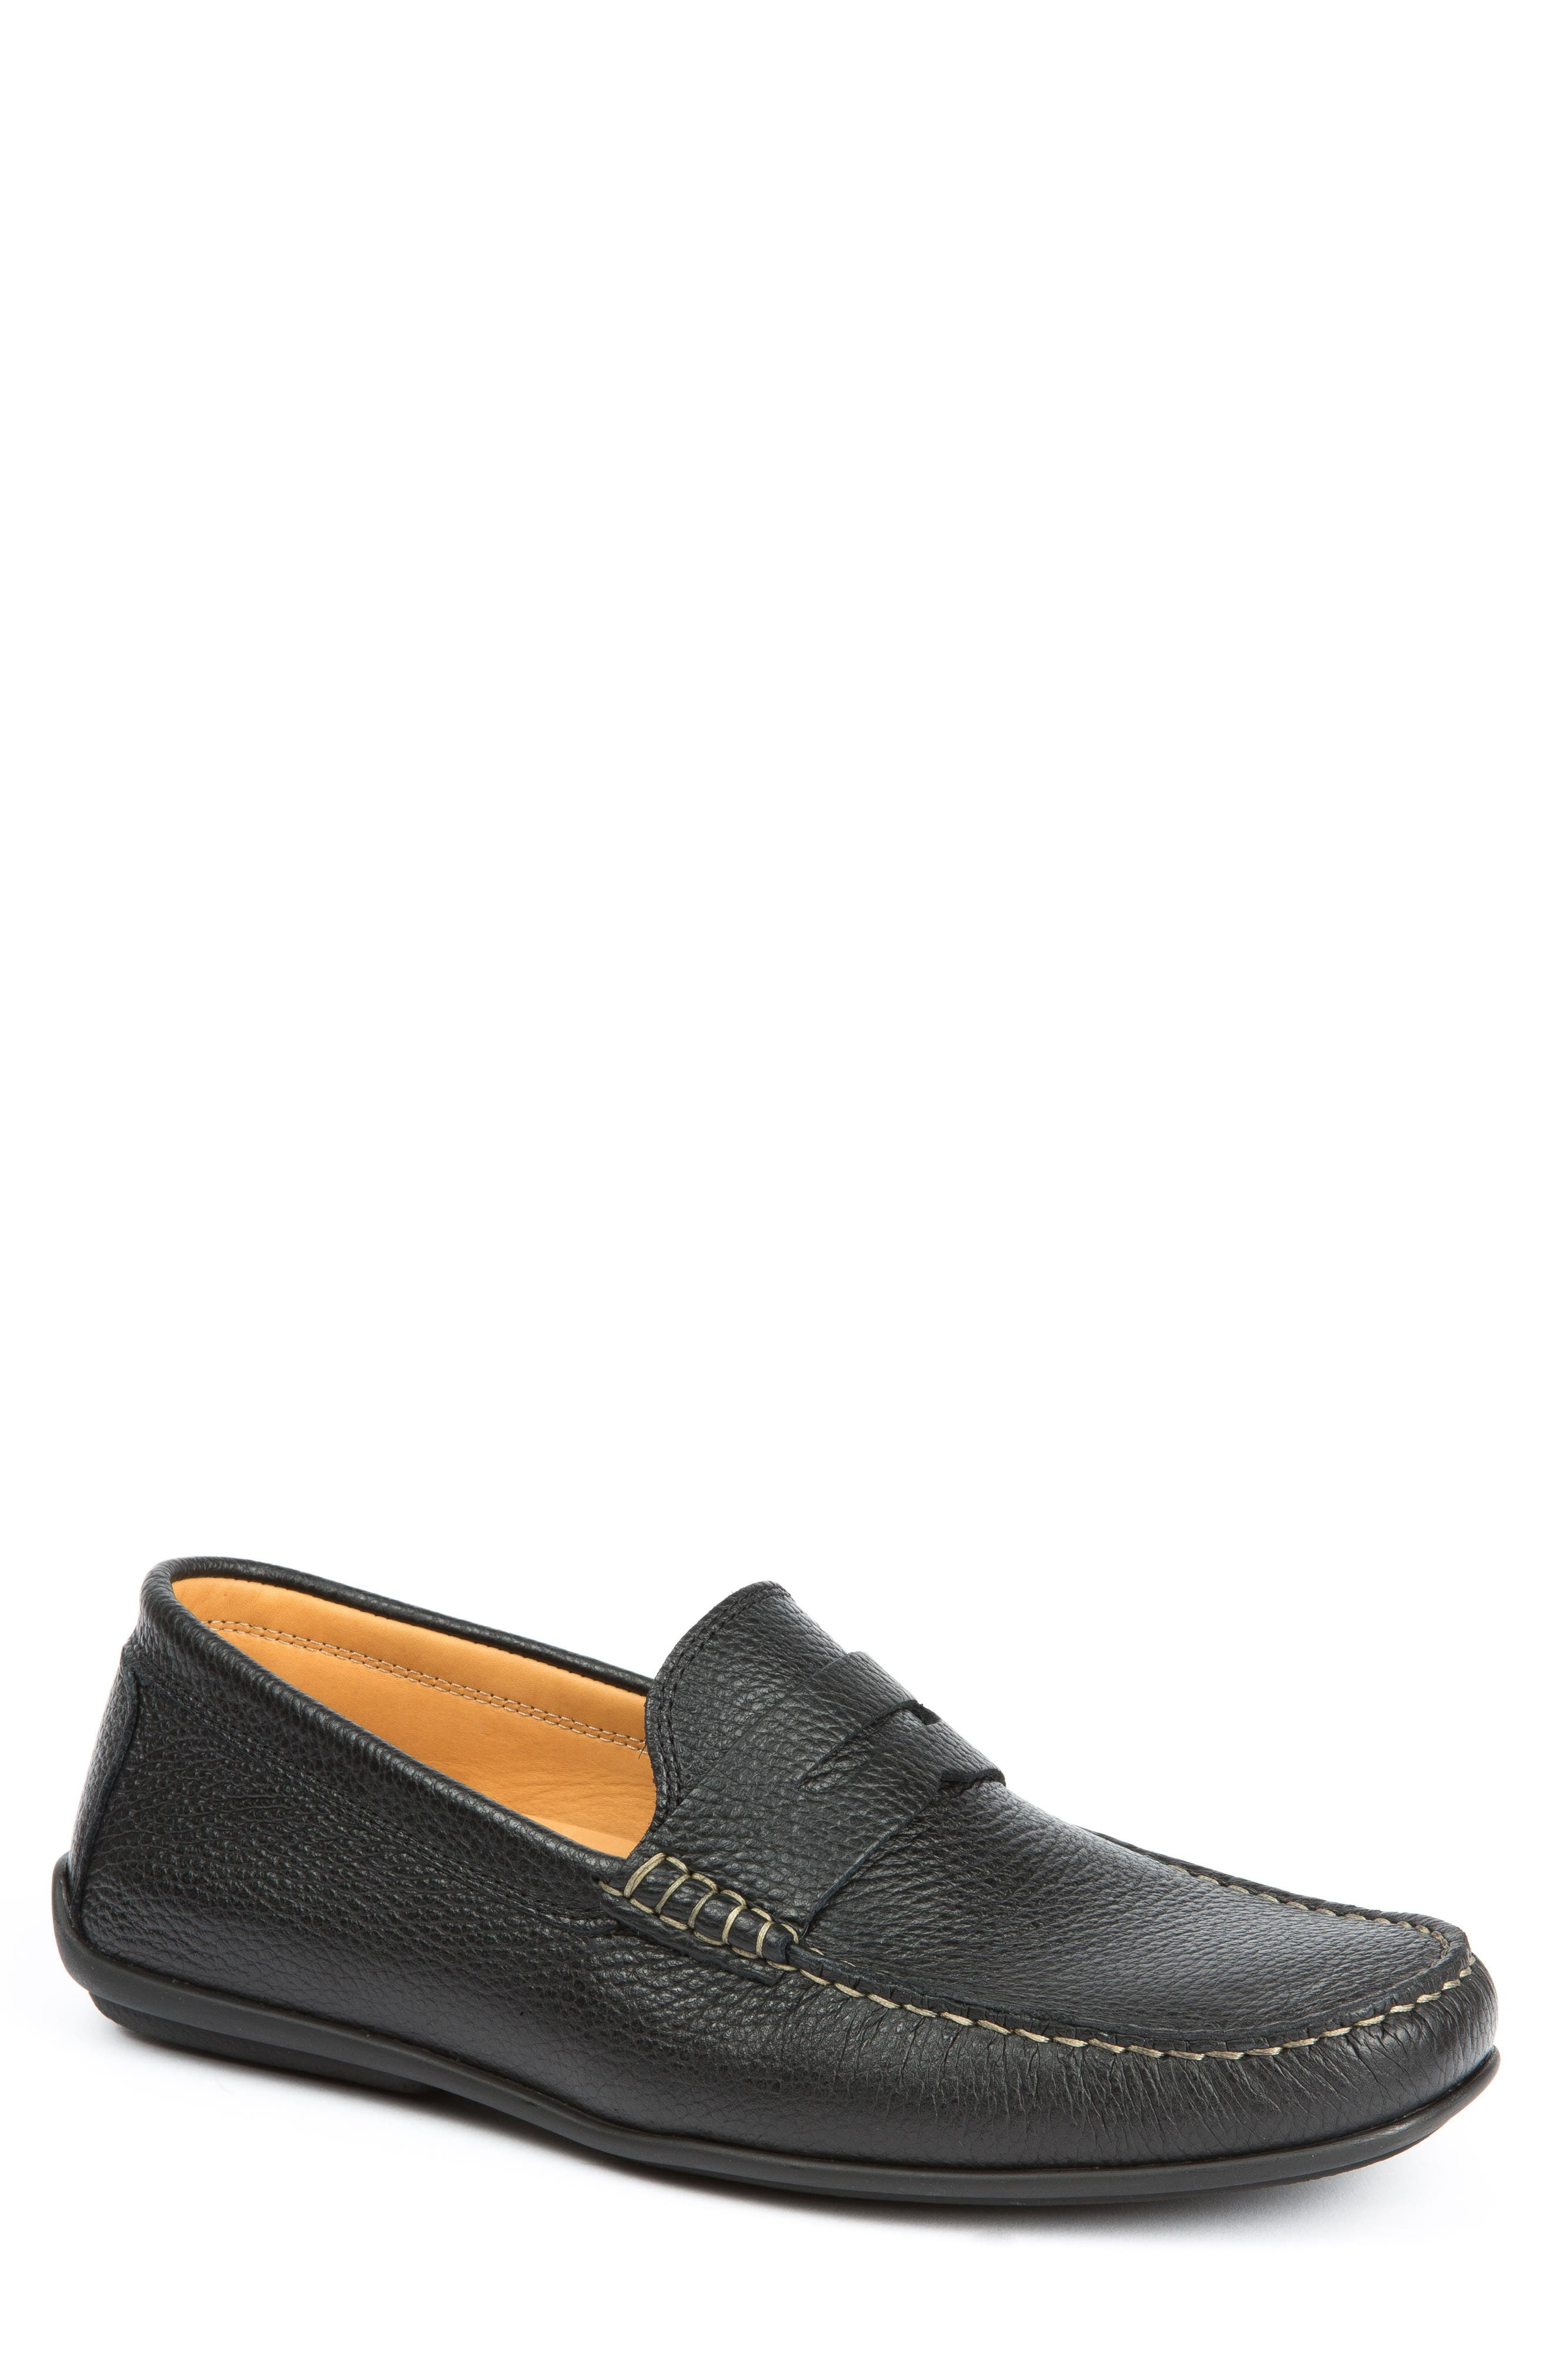 Hudsons Driving Shoe,                         Main,                         color, BLACK GRAIN